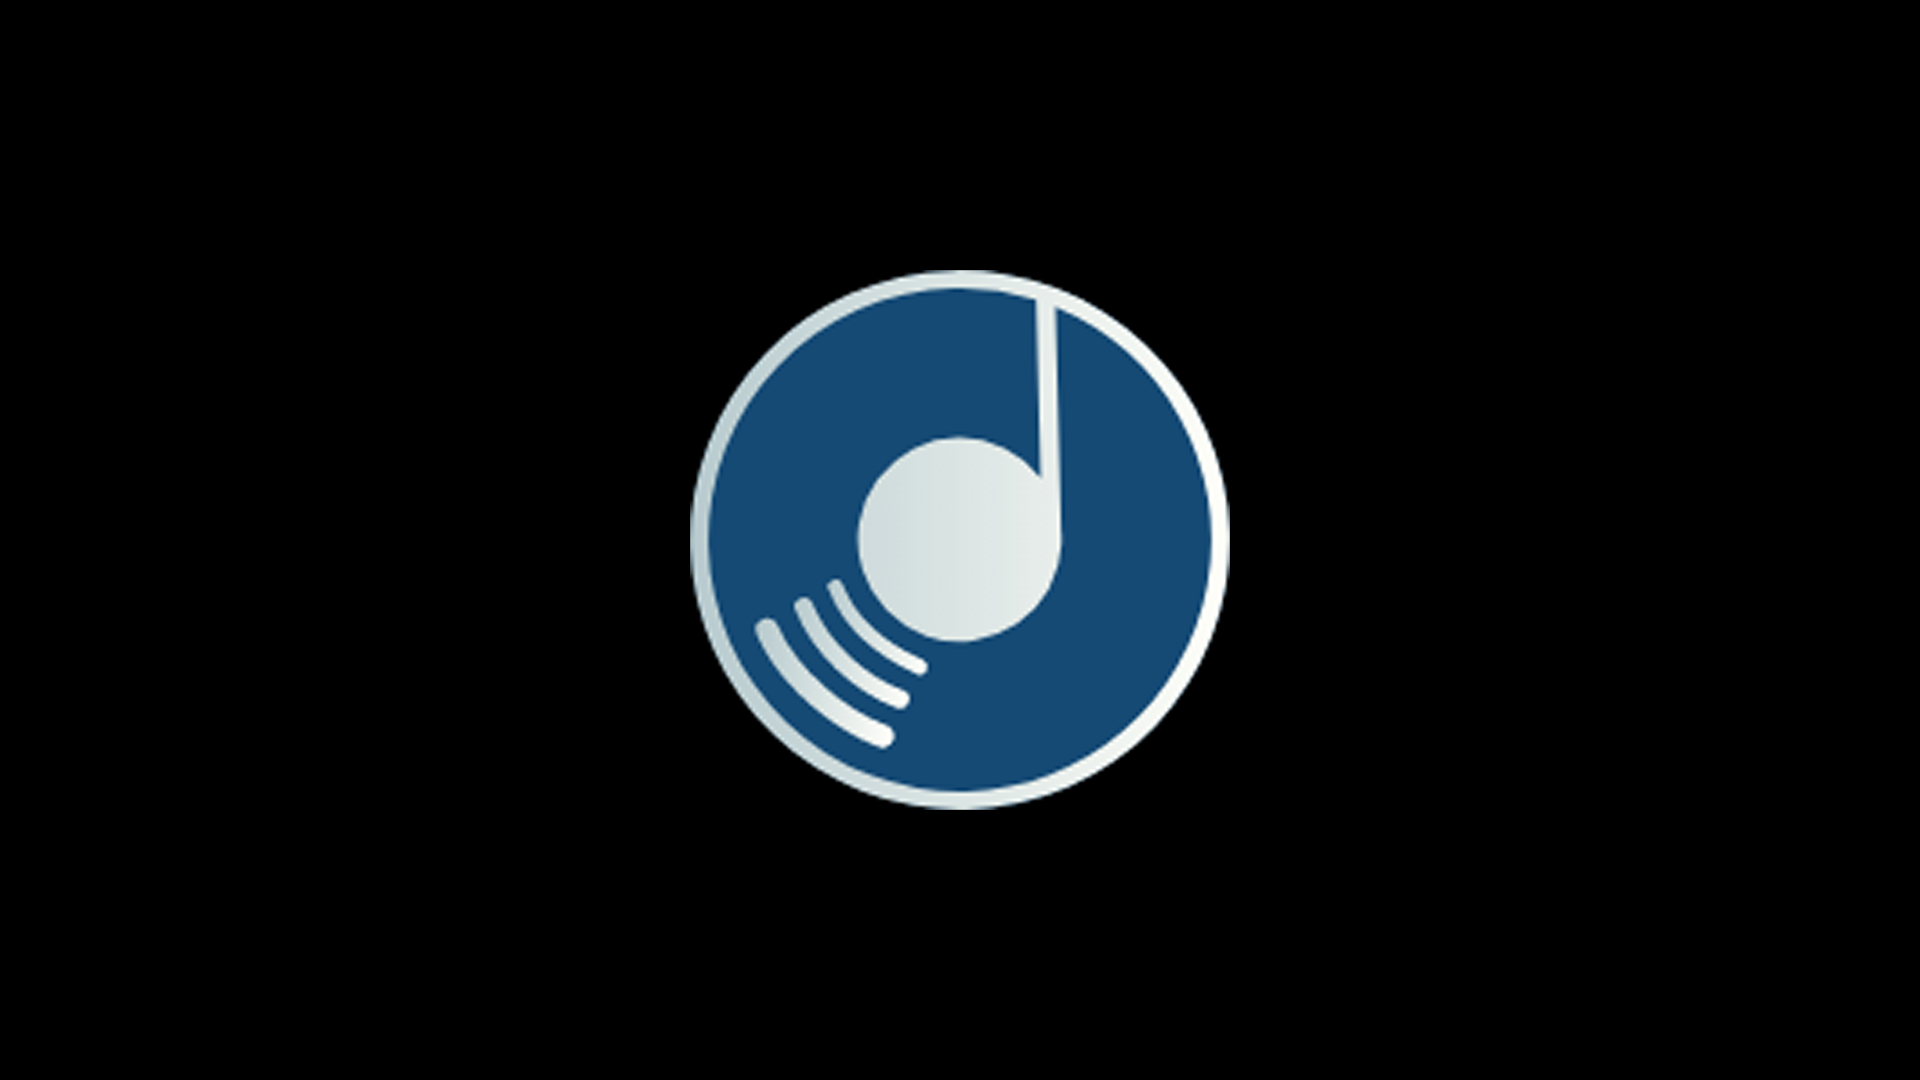 Meilleur Convertisseur Spotify vers MP3 – TuneFab Convertisseur Spotify